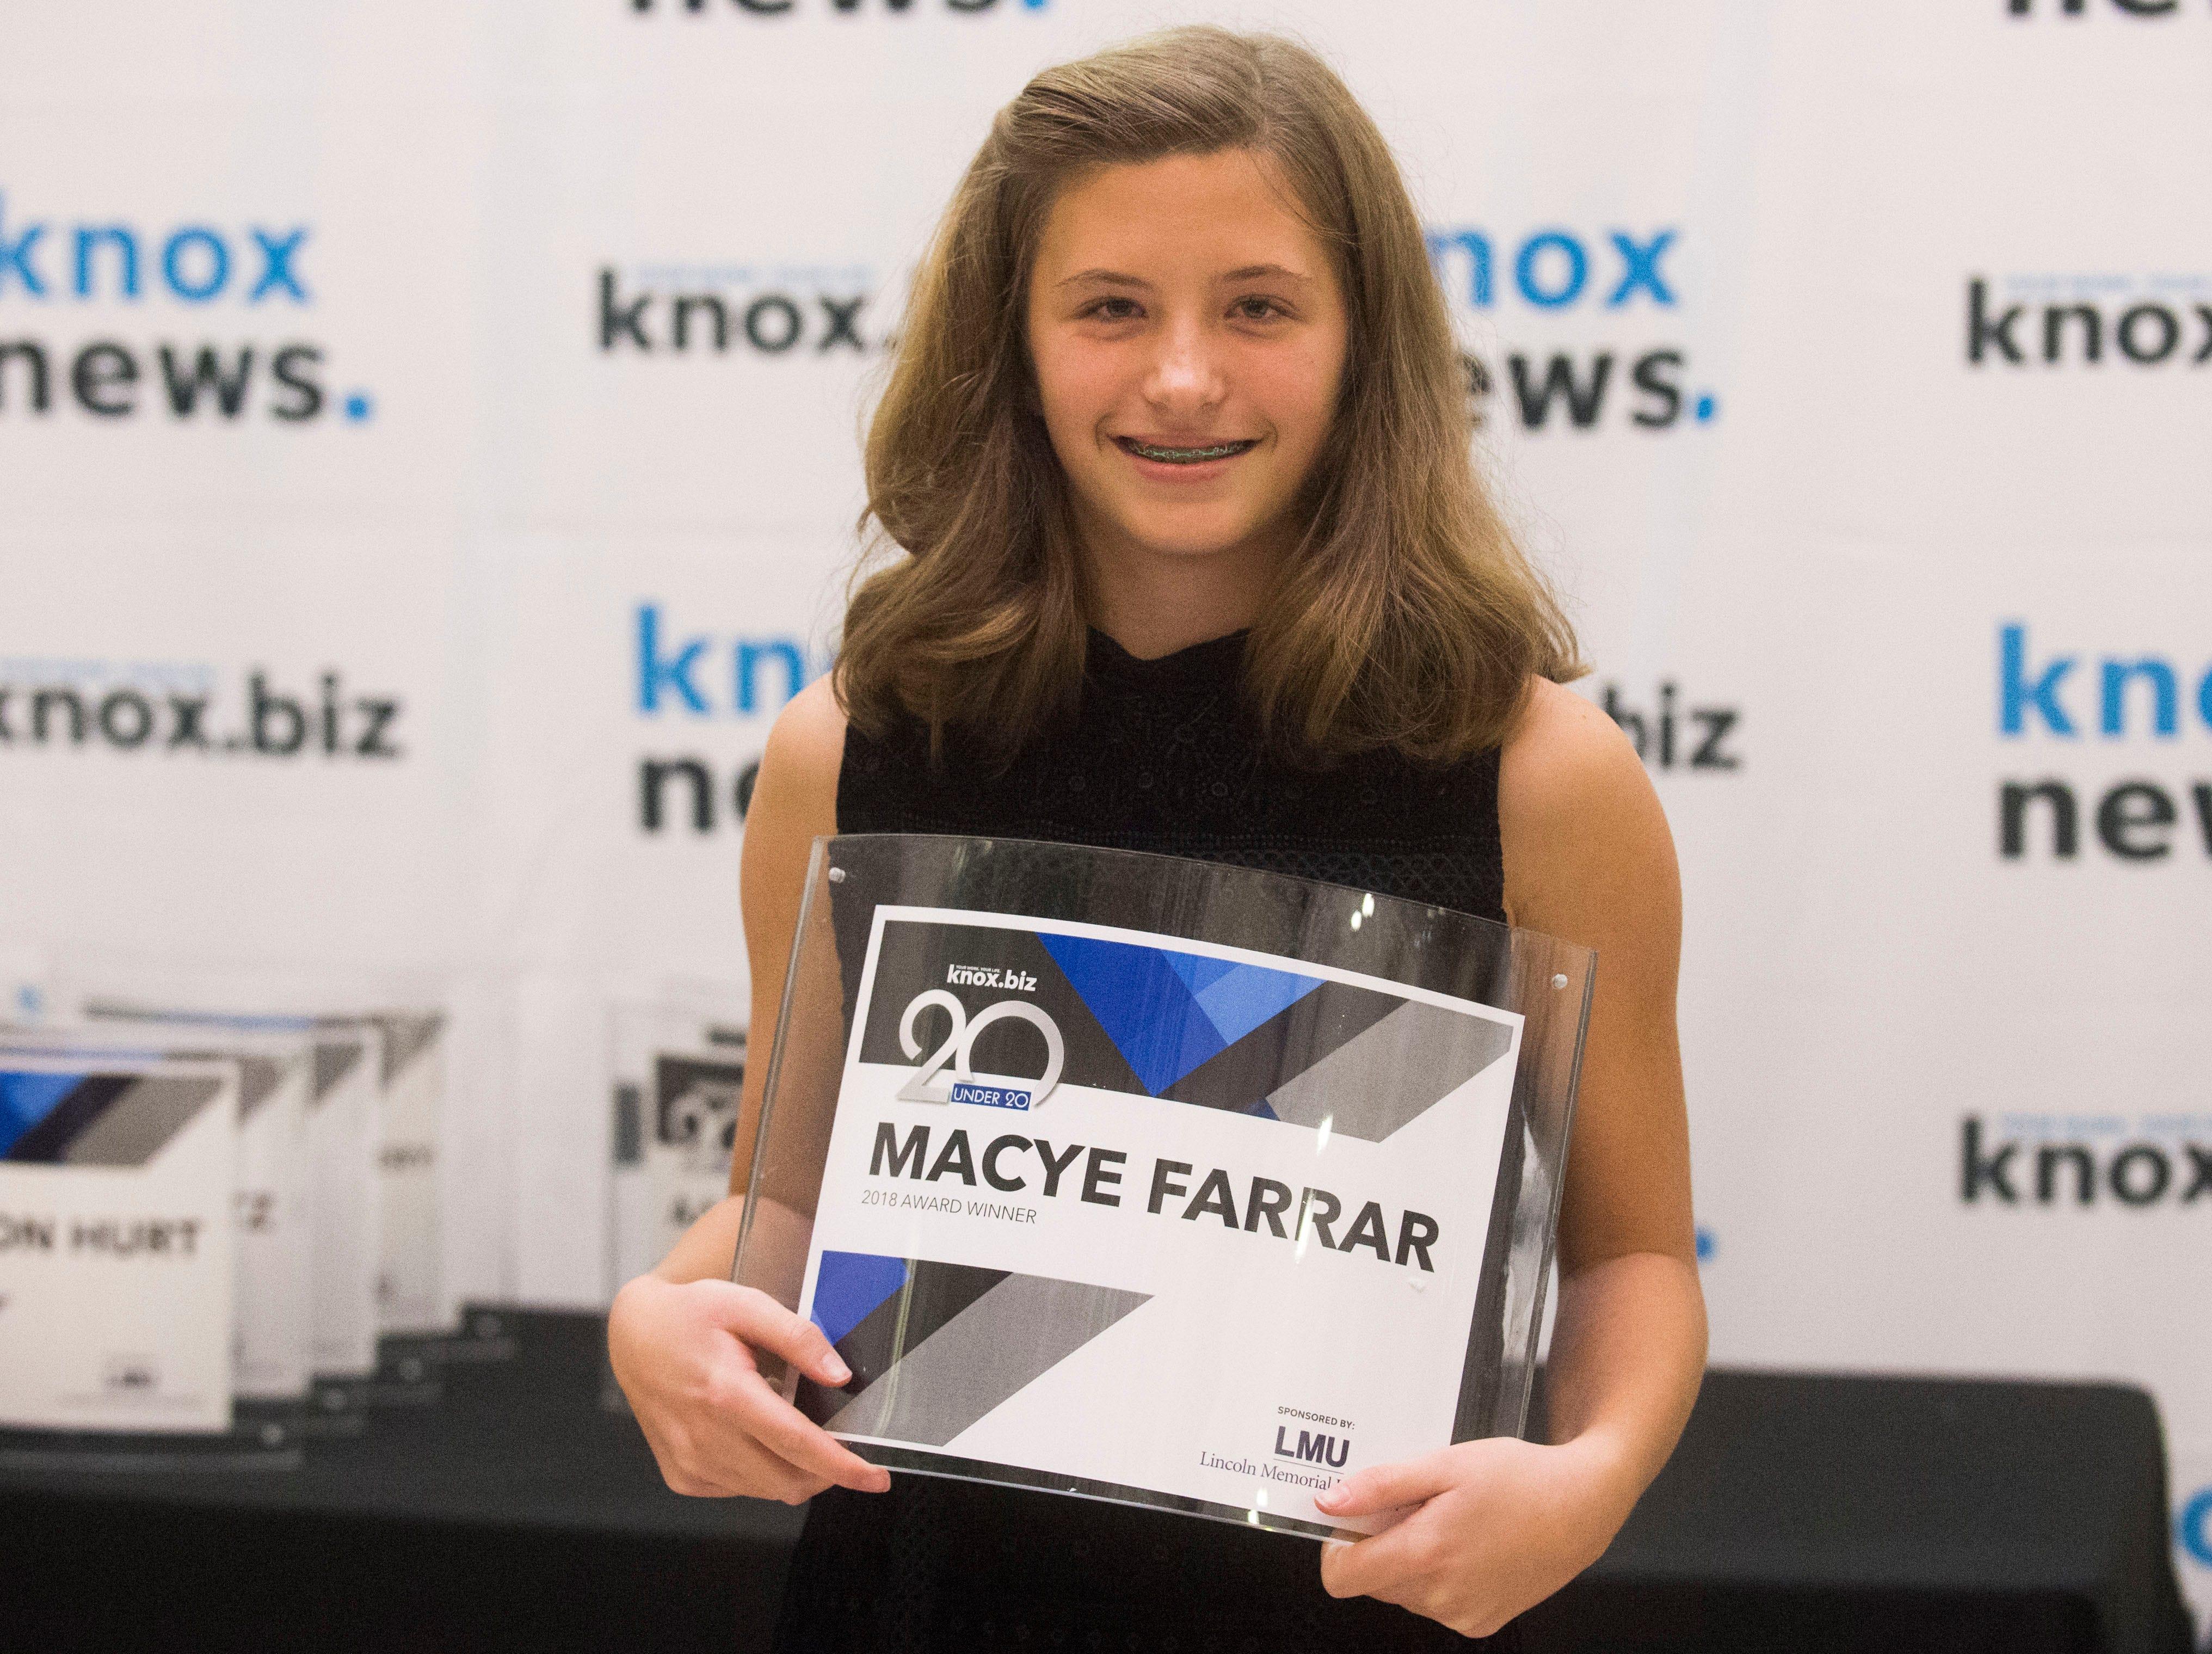 Macye Farrar, 20 under 20 award recipient.